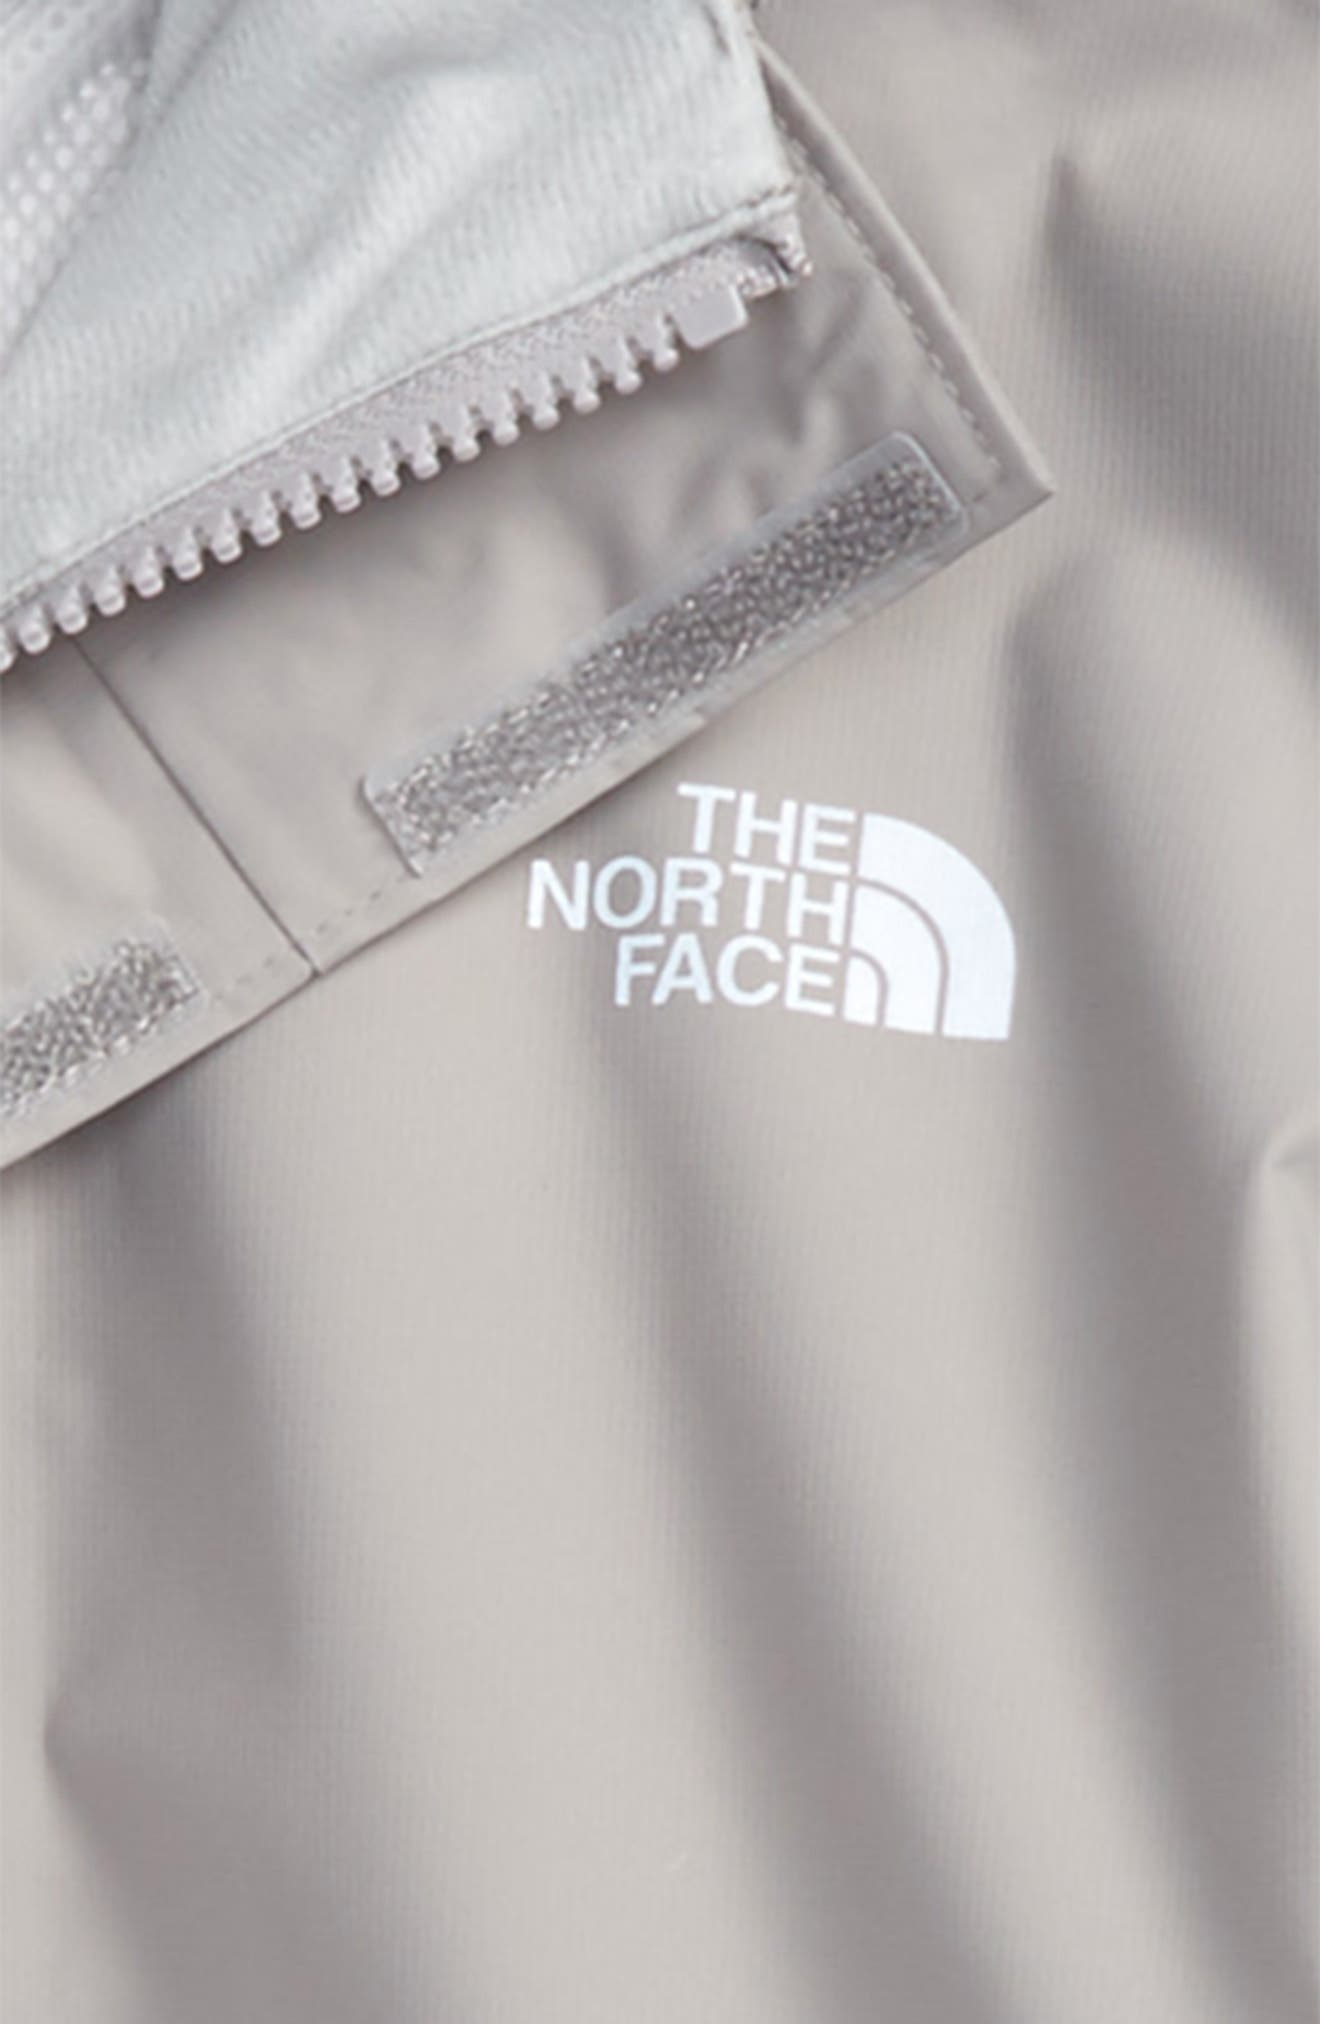 'Resolve' Reflective Waterproof Jacket,                             Alternate thumbnail 2, color,                             021